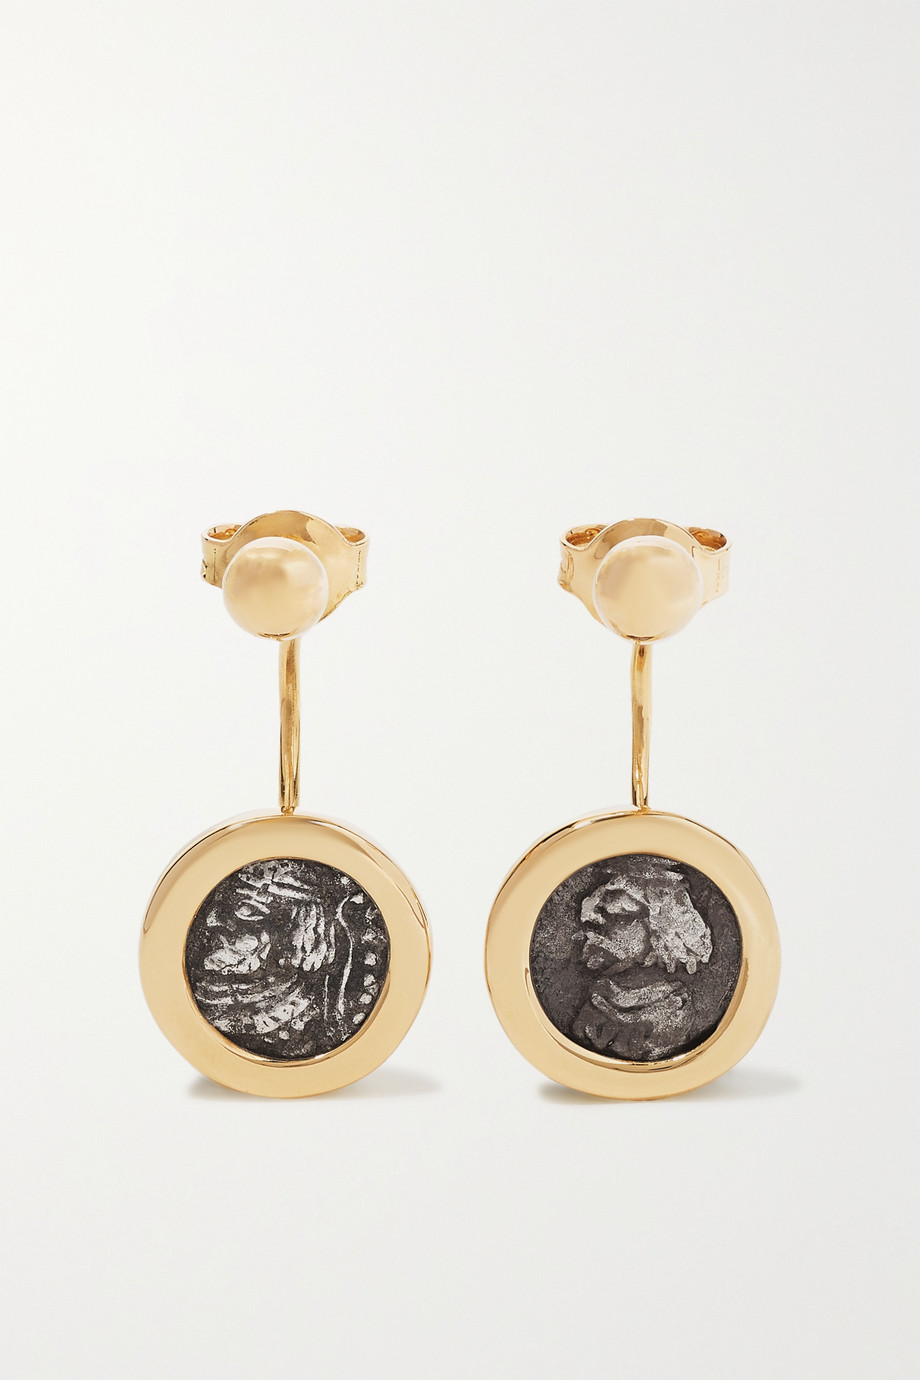 Dubini 18-karat gold and silver earrings